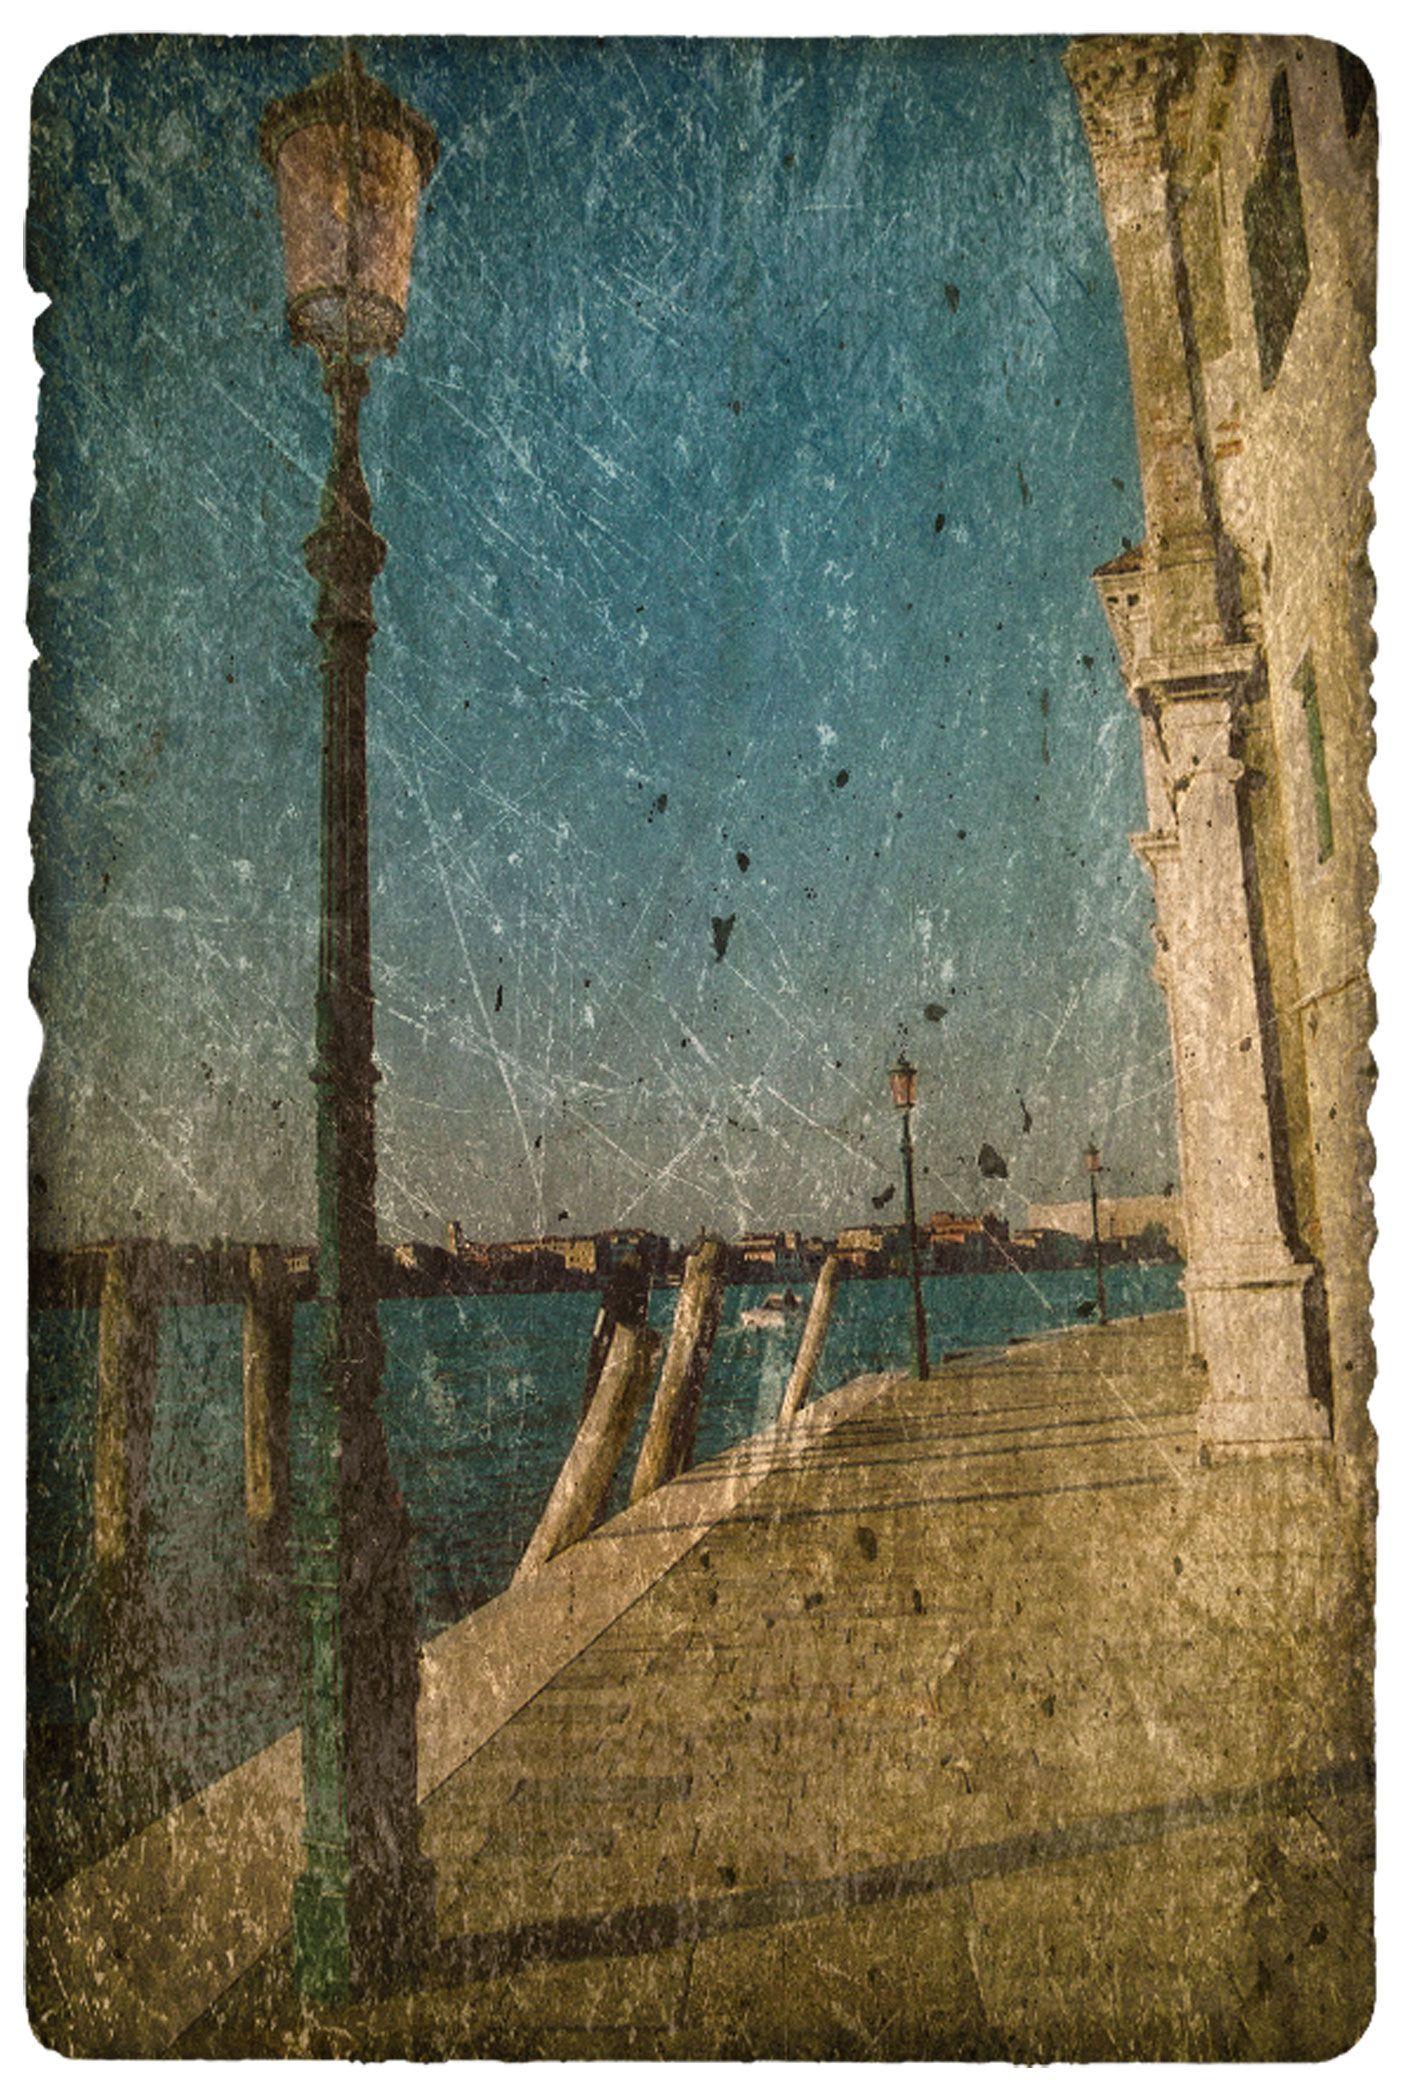 Zattere ~ Venezia ~ Bailey Zimmerman